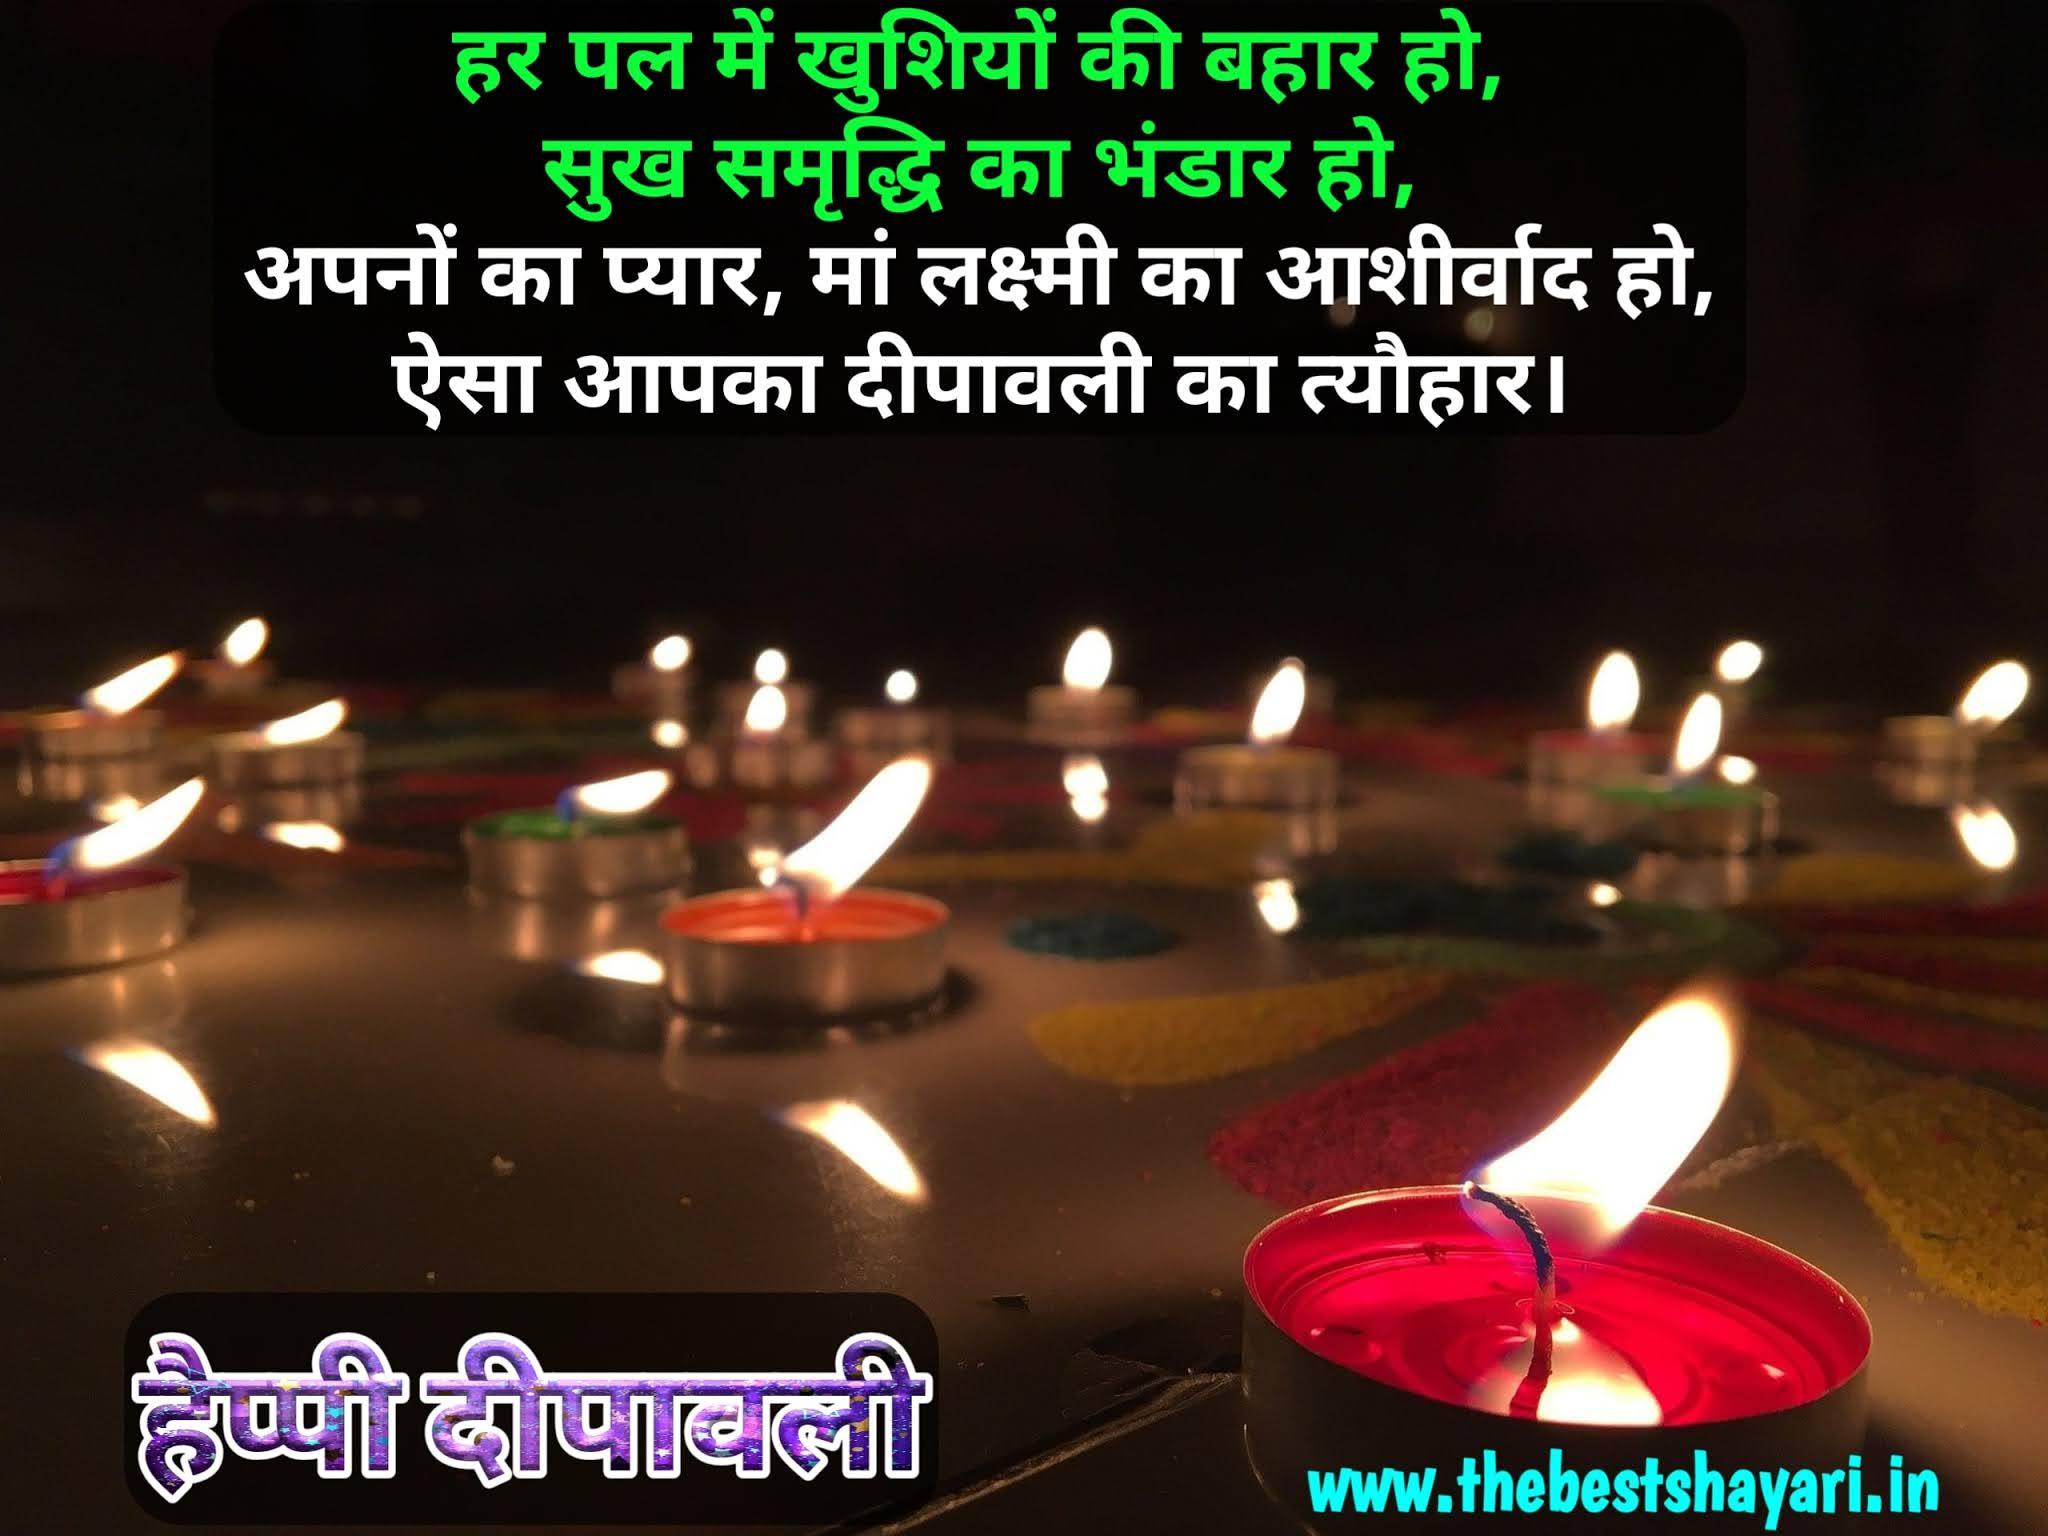 Hindi wishes for diwali